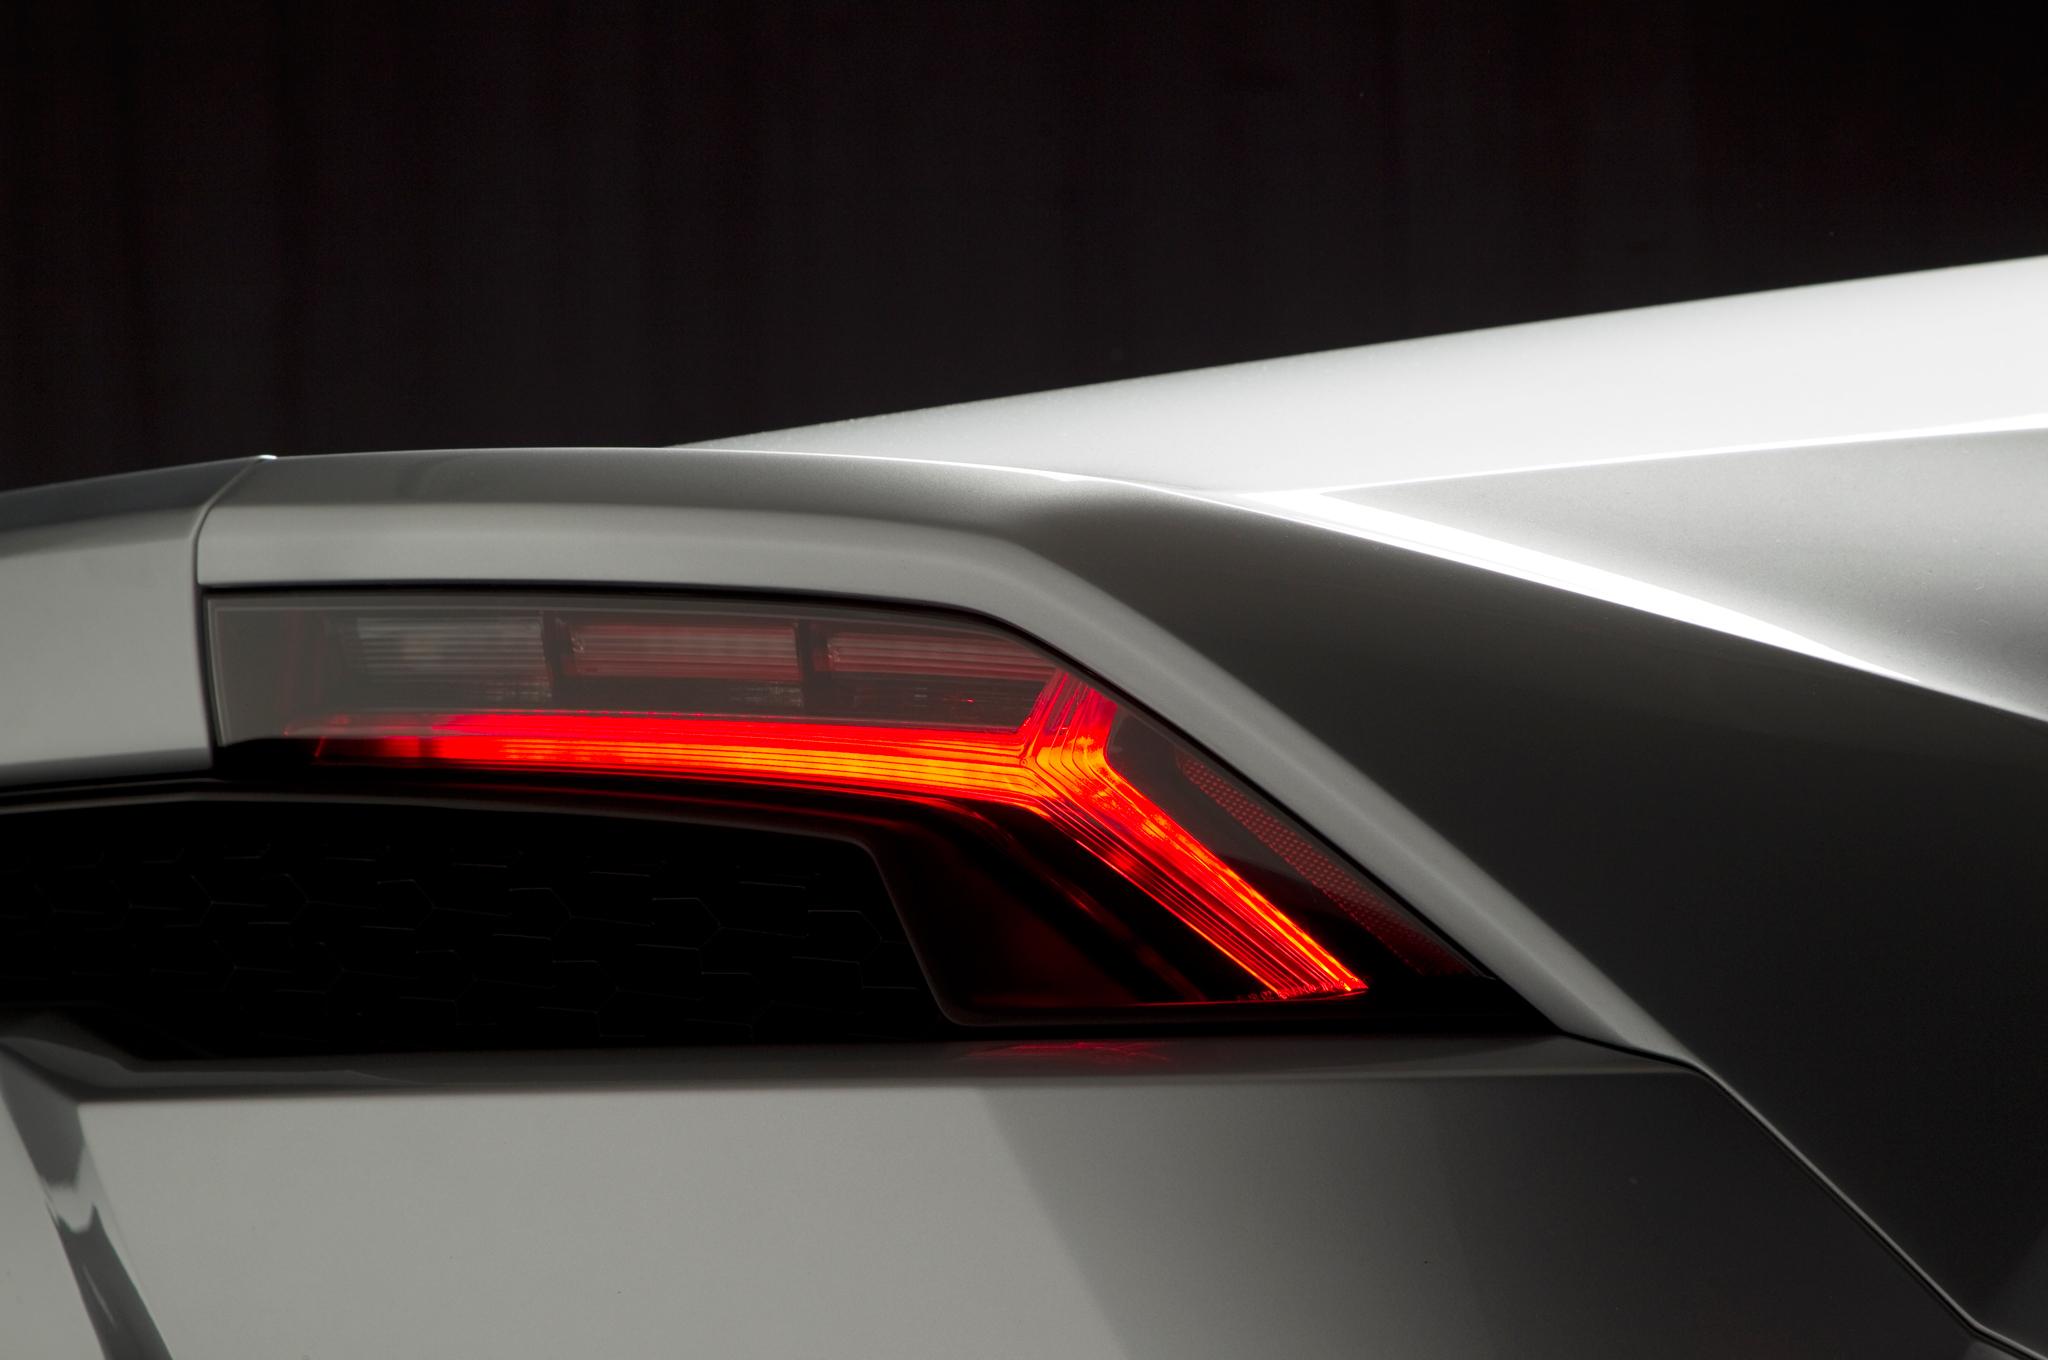 http—image.motortrend.com-f-roadtests-exotic-1312_2015_lamborghini_huracan_first_look-59412206-2015-Lamborghini-Huracan-taillight-02